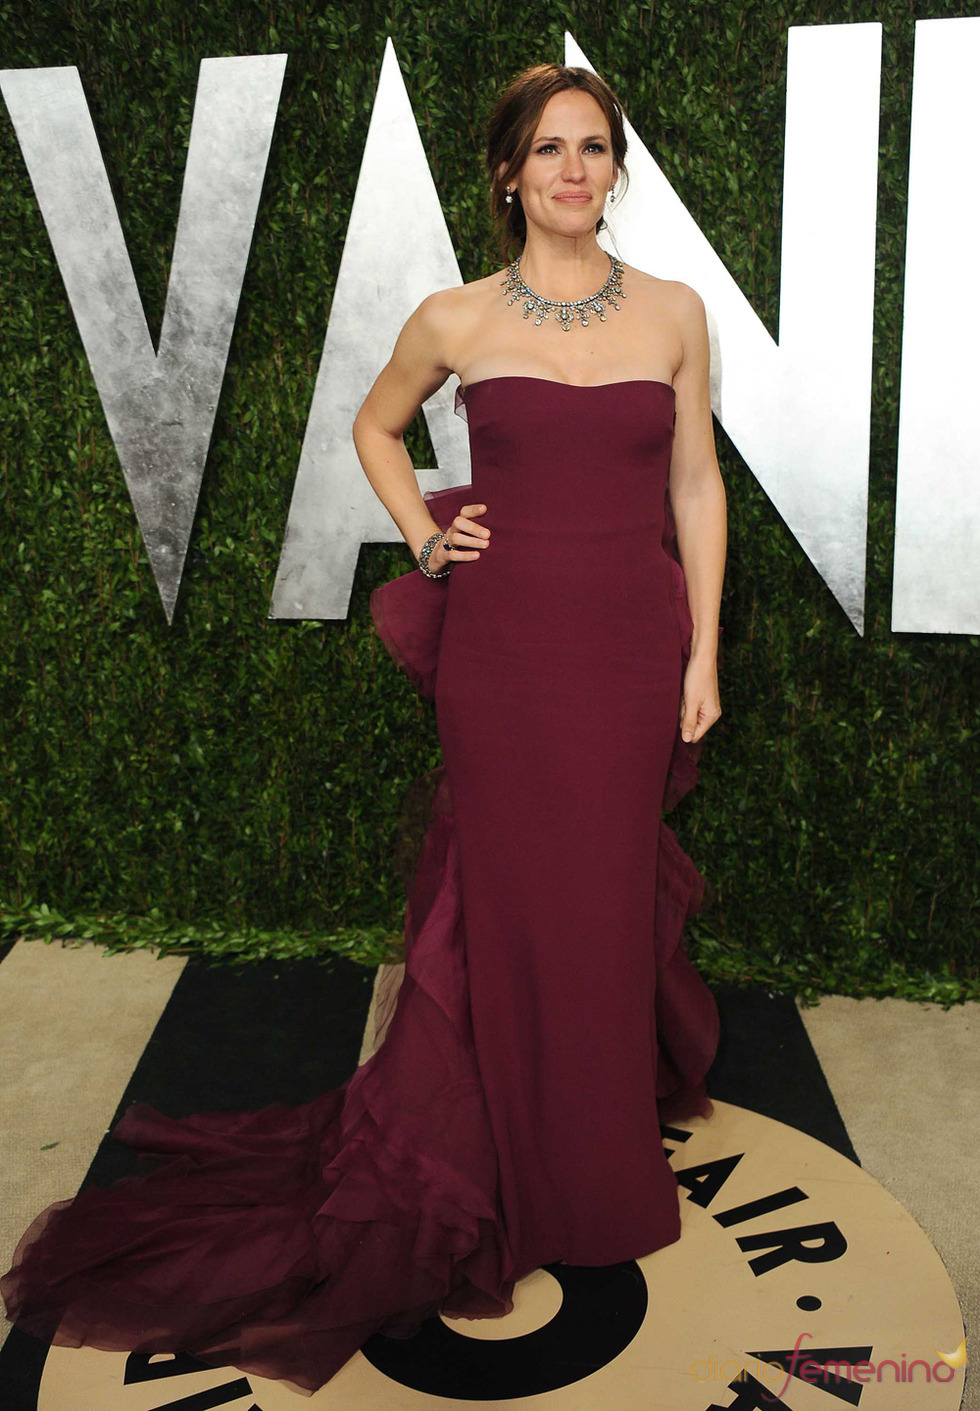 Jennifer Garner en la fiesta de Vanity celebrada tras los Oscar 2013